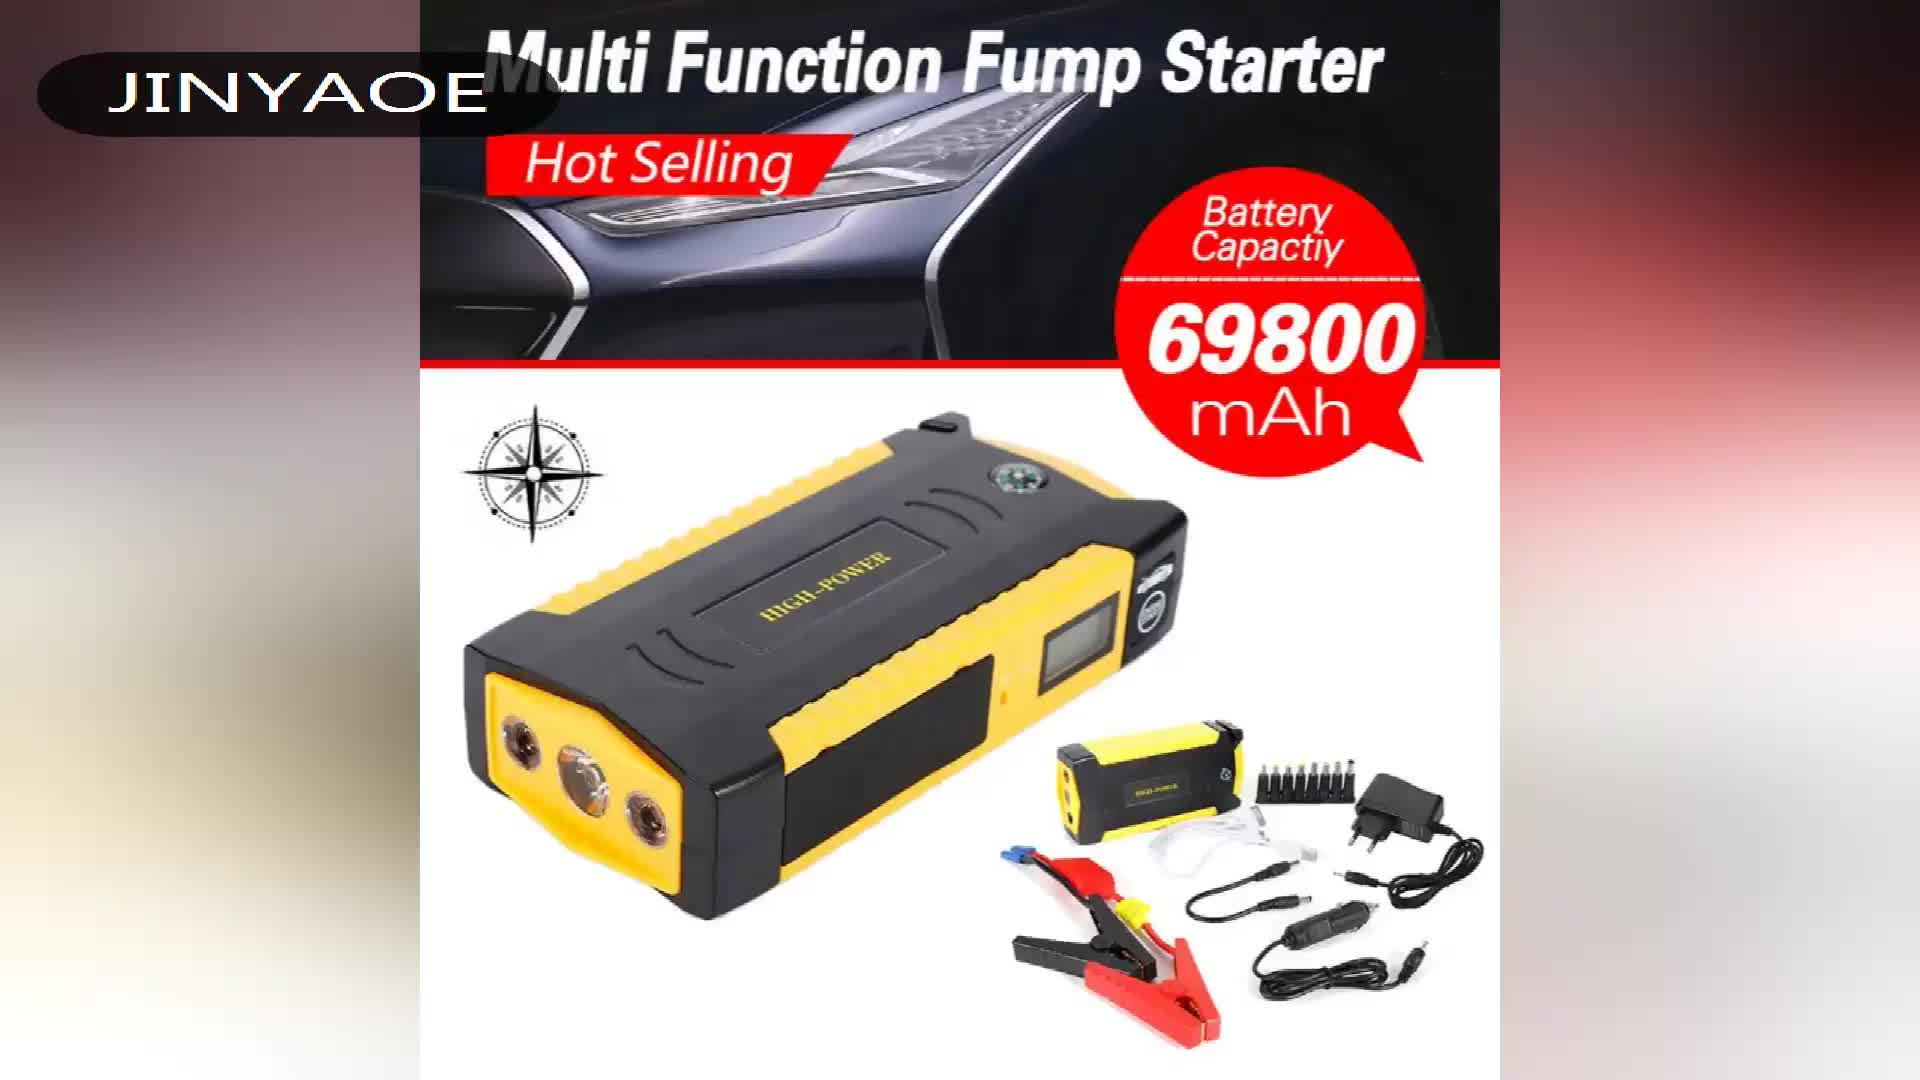 69800 mah porta 4USB 18650 jump start impulsionador da bateria com LCD para 6.0L jumpstarter carro diesel